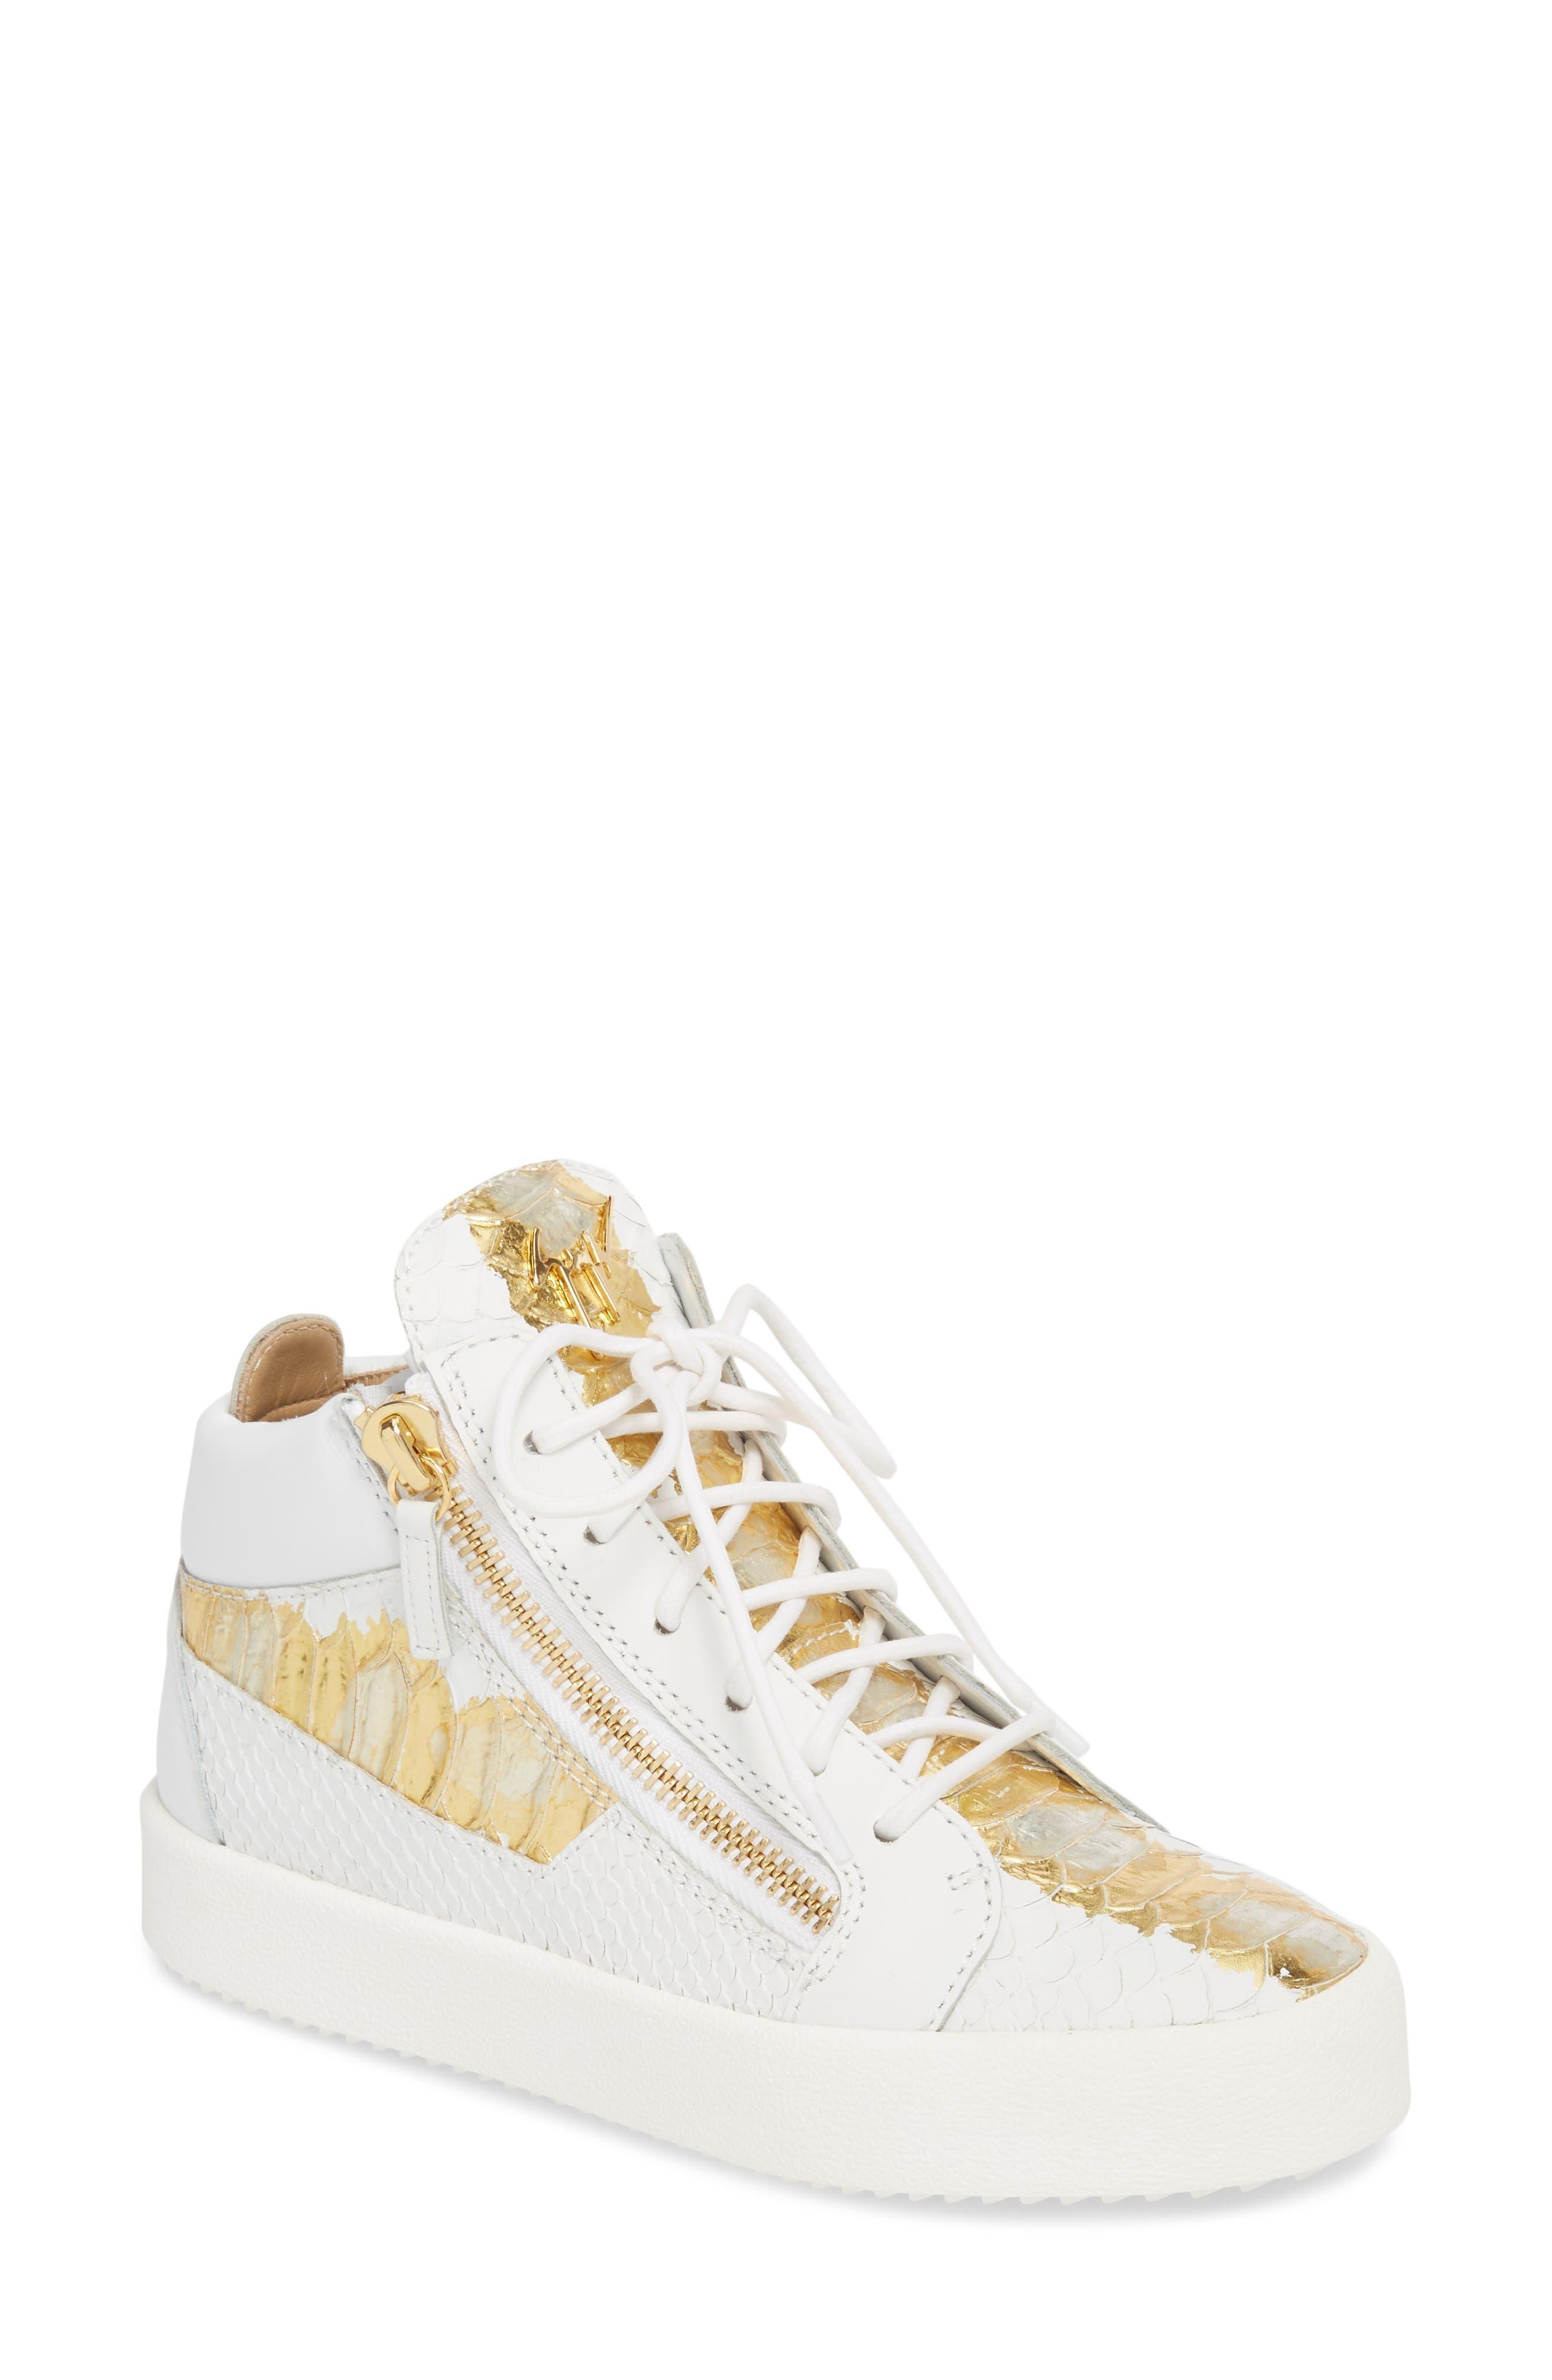 GIUSEPPE ZANOTTI May London Mid Top Sneaker, Main, color, WHITE/NEON YELLOW